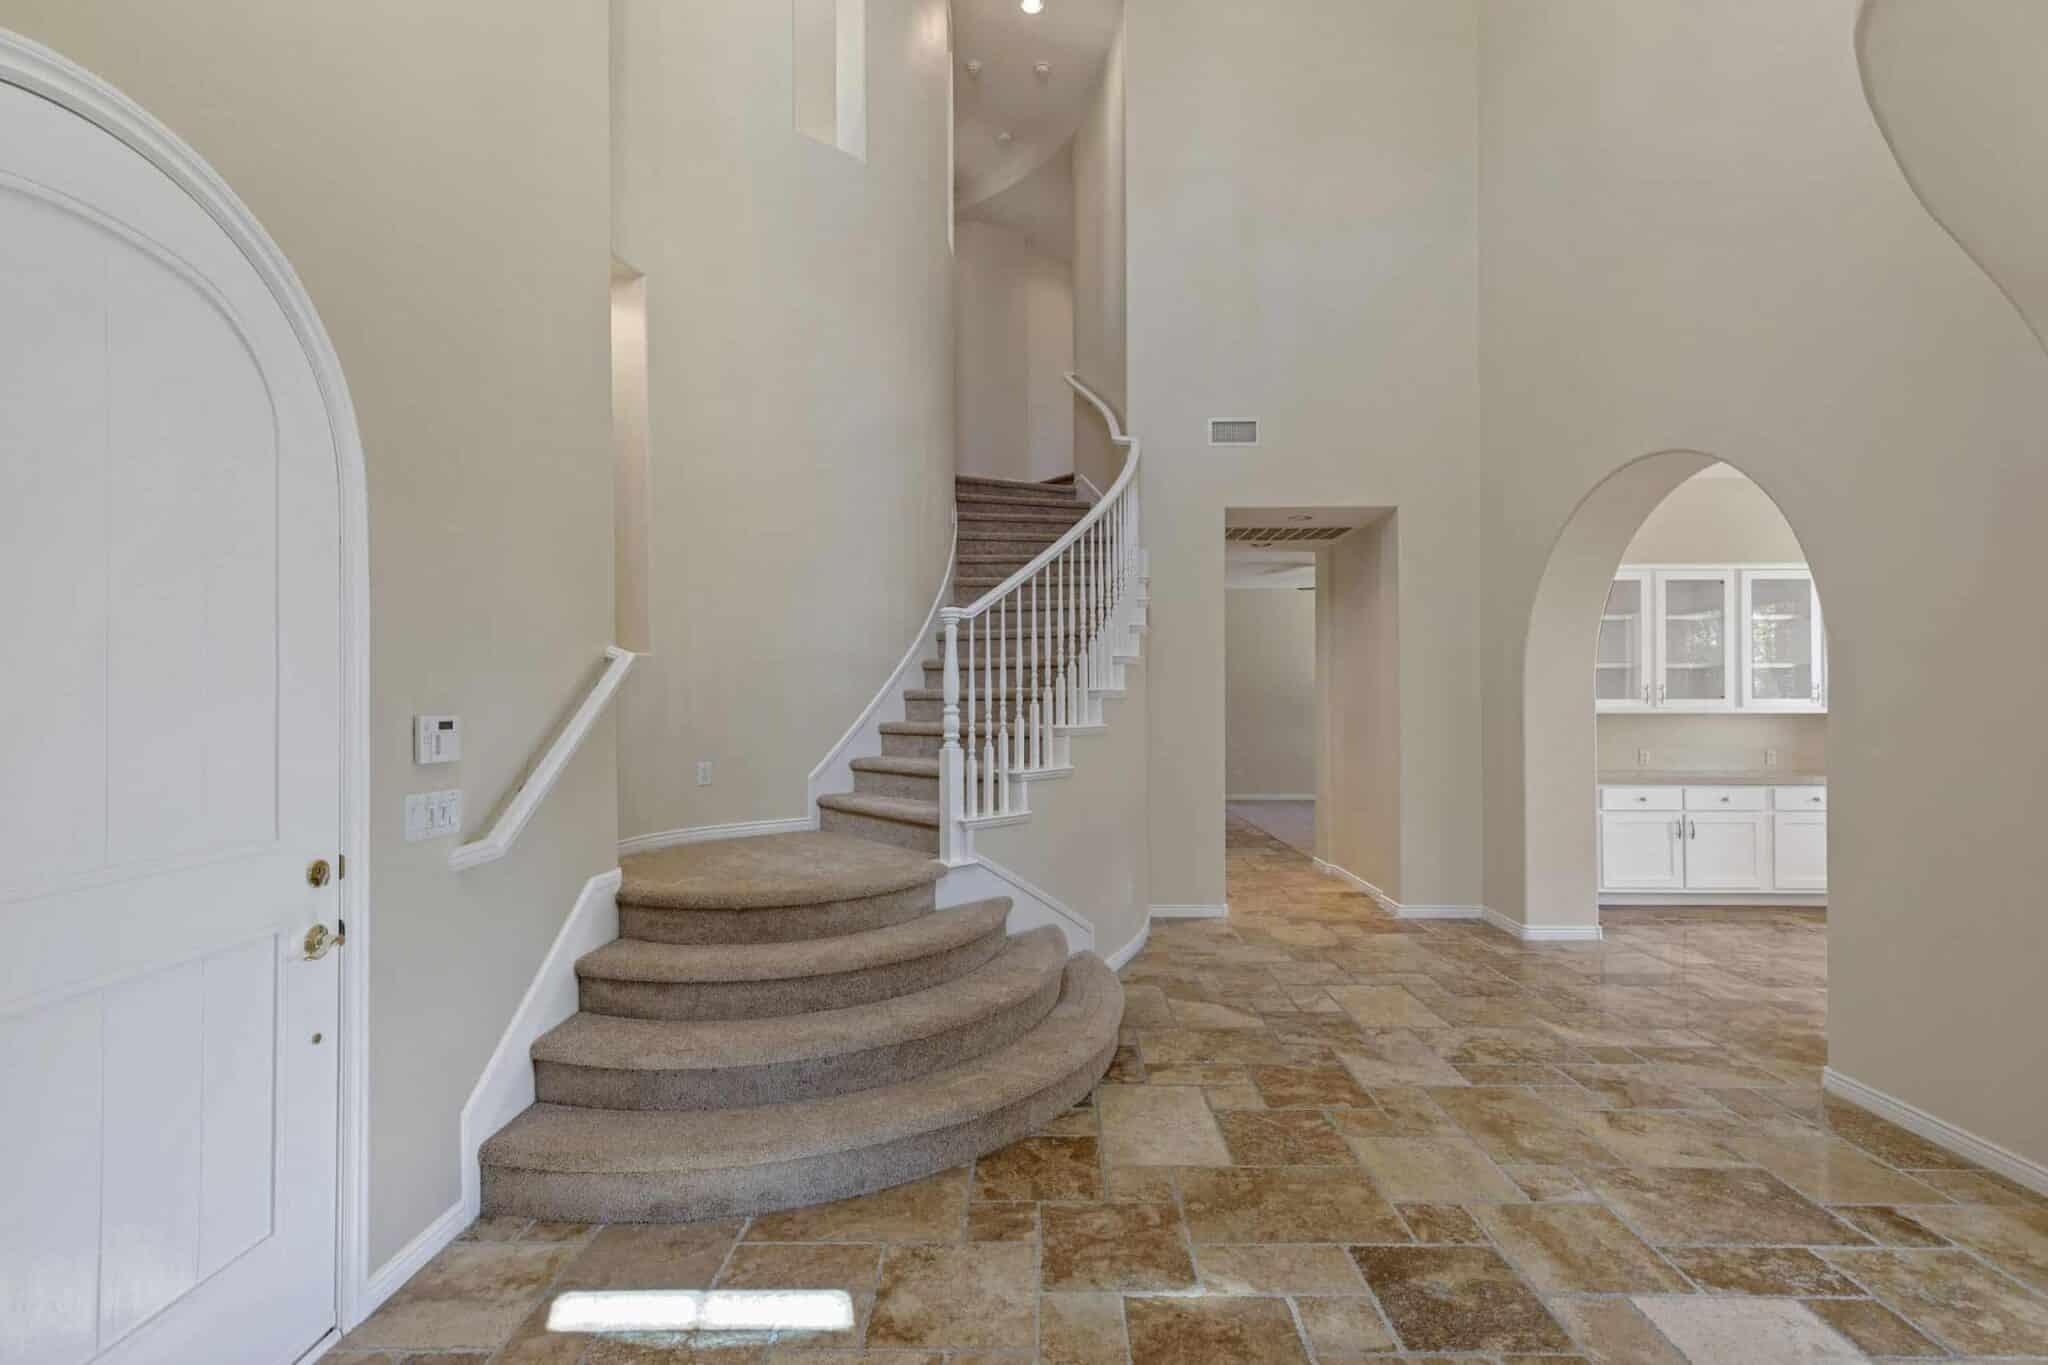 las-vegas-luxry-real-estate-realtor-rob-jensen-company-2620-grassy-spring-place-rrcc07